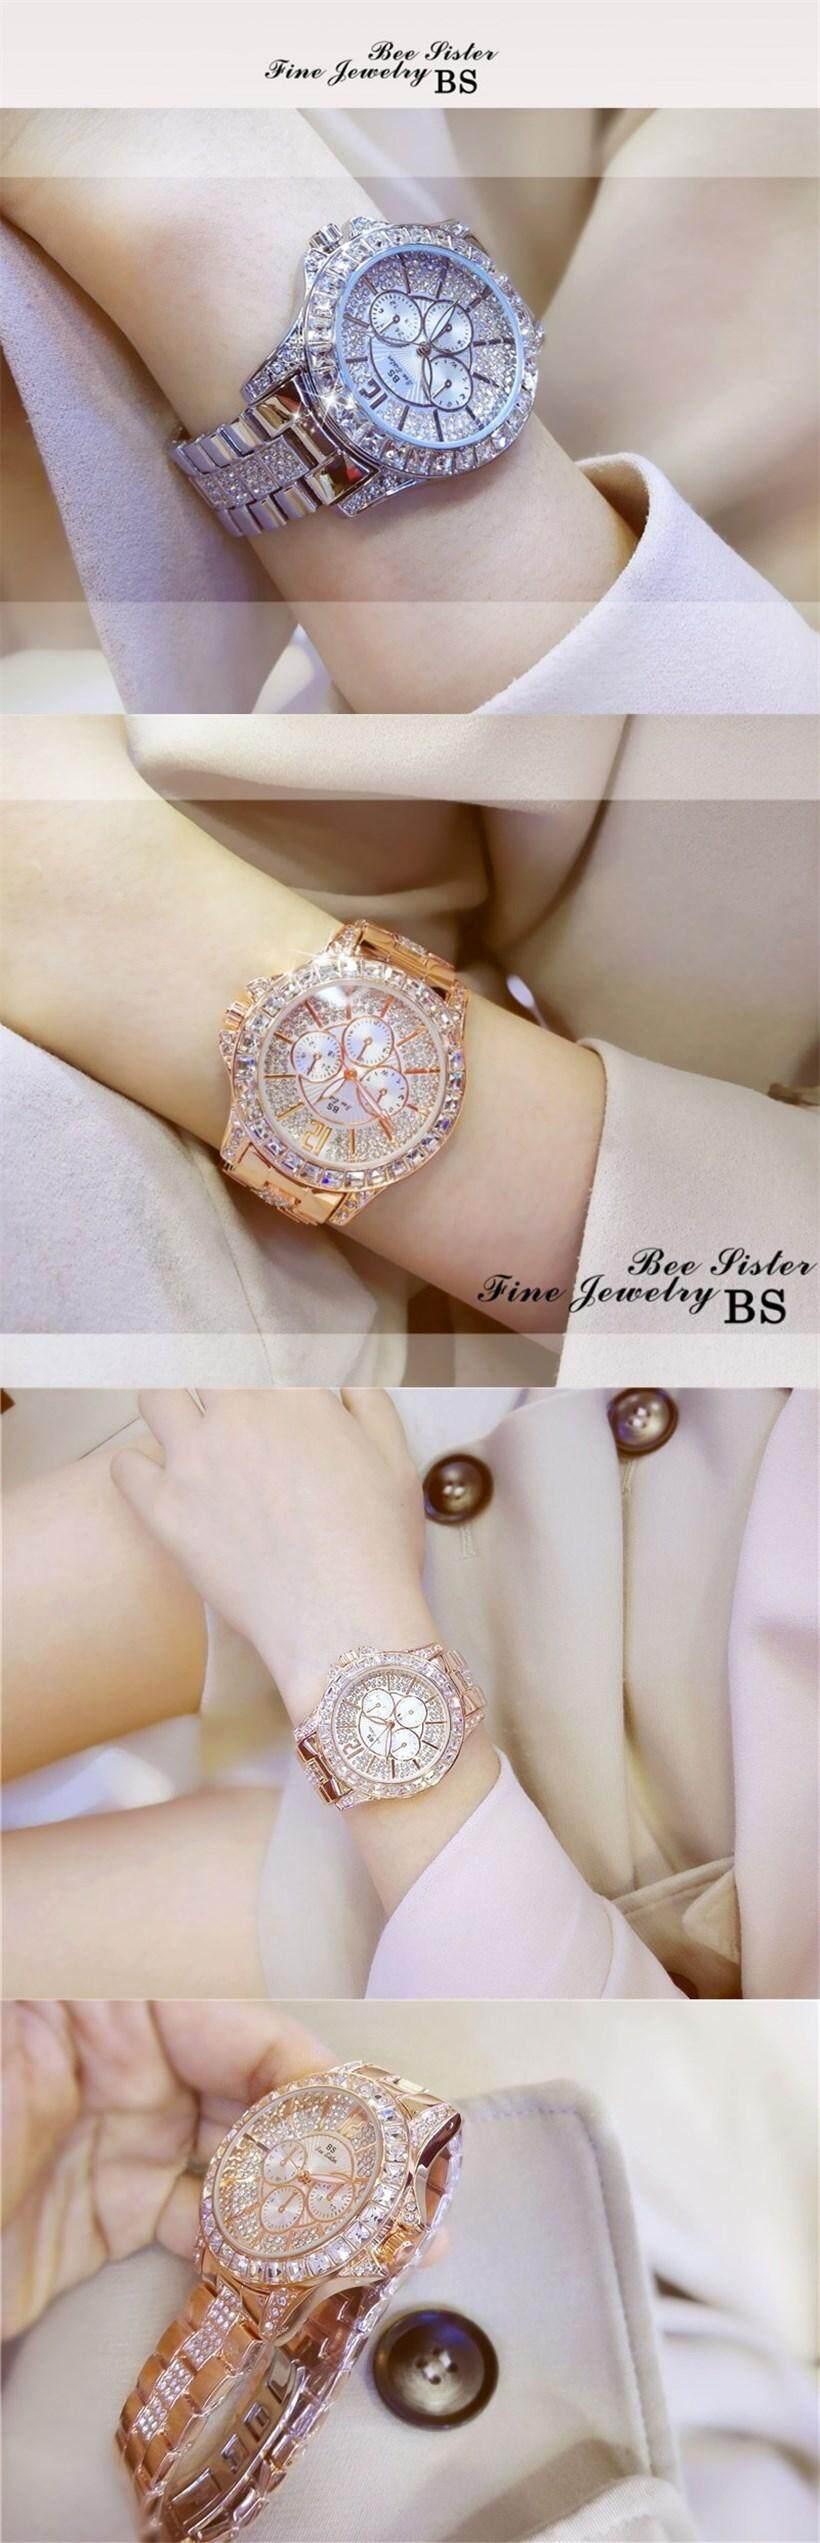 bs-womenquartzwatch-branddiamond-detail03.jpg